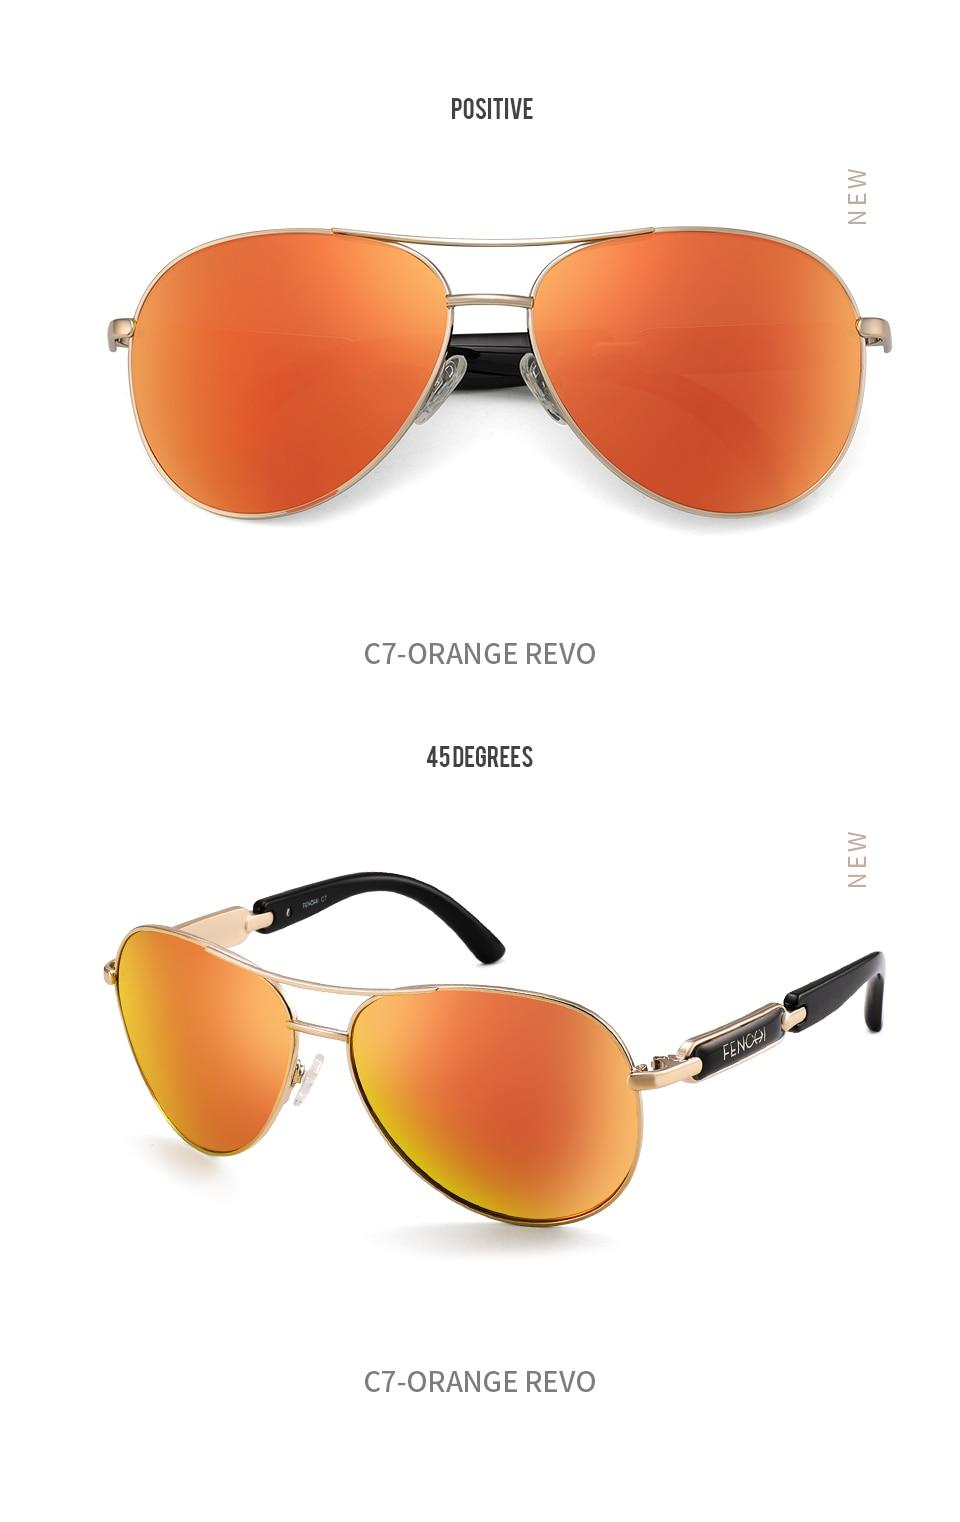 H2990cc756dec448dabe893e0f384f943m FENCHI Polarized Sunglasses Women Vintage Brand Glasses Driving Pilot Pink Mirror sunglasses Men ladies oculos de sol feminino